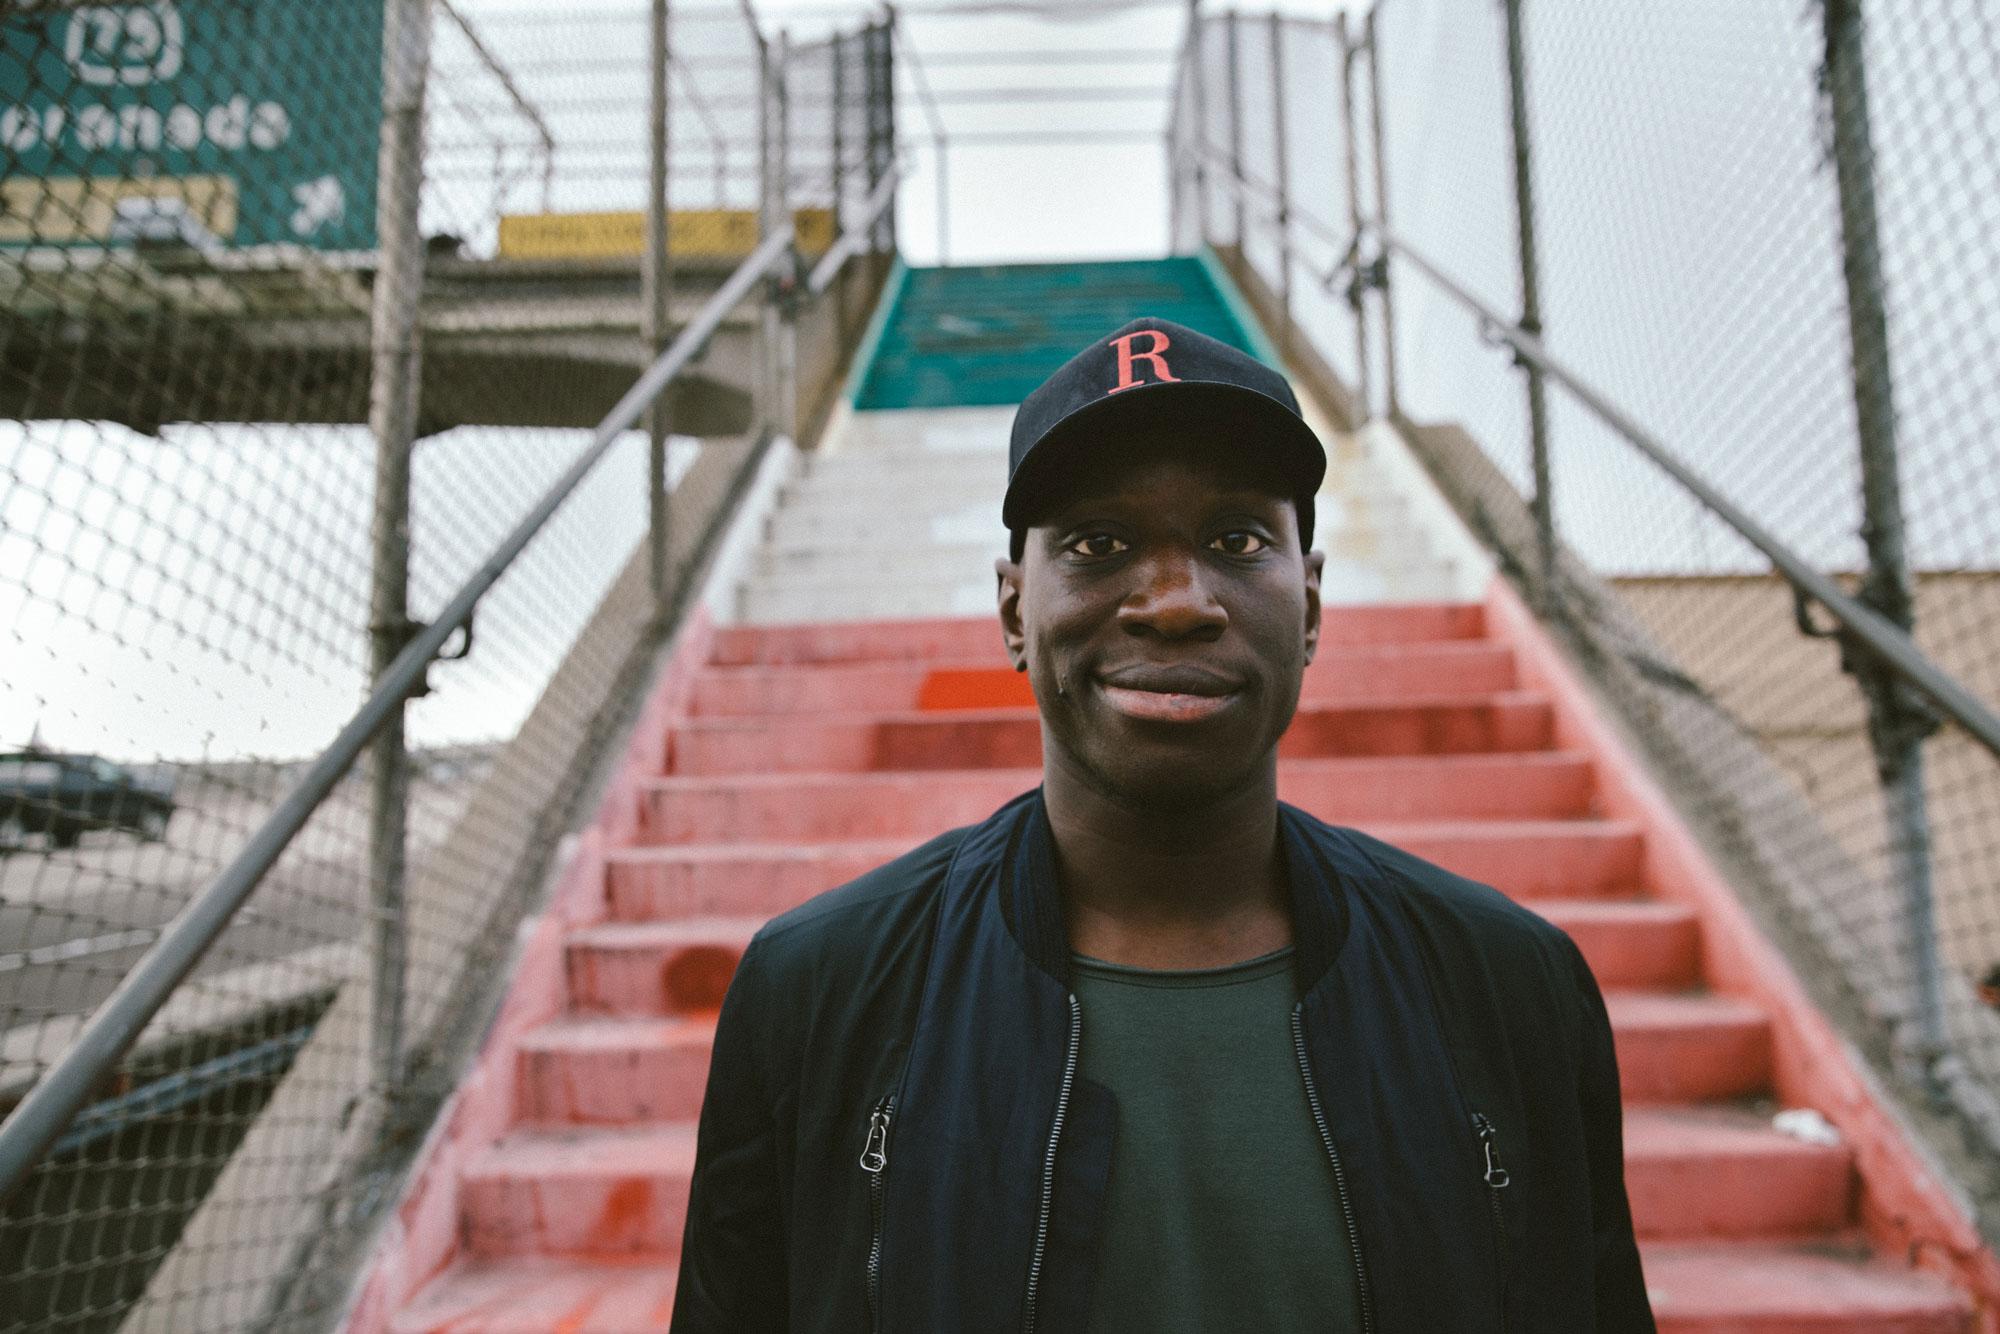 Demba Ba partage sa vision pour son futur club, San Diego Nasl